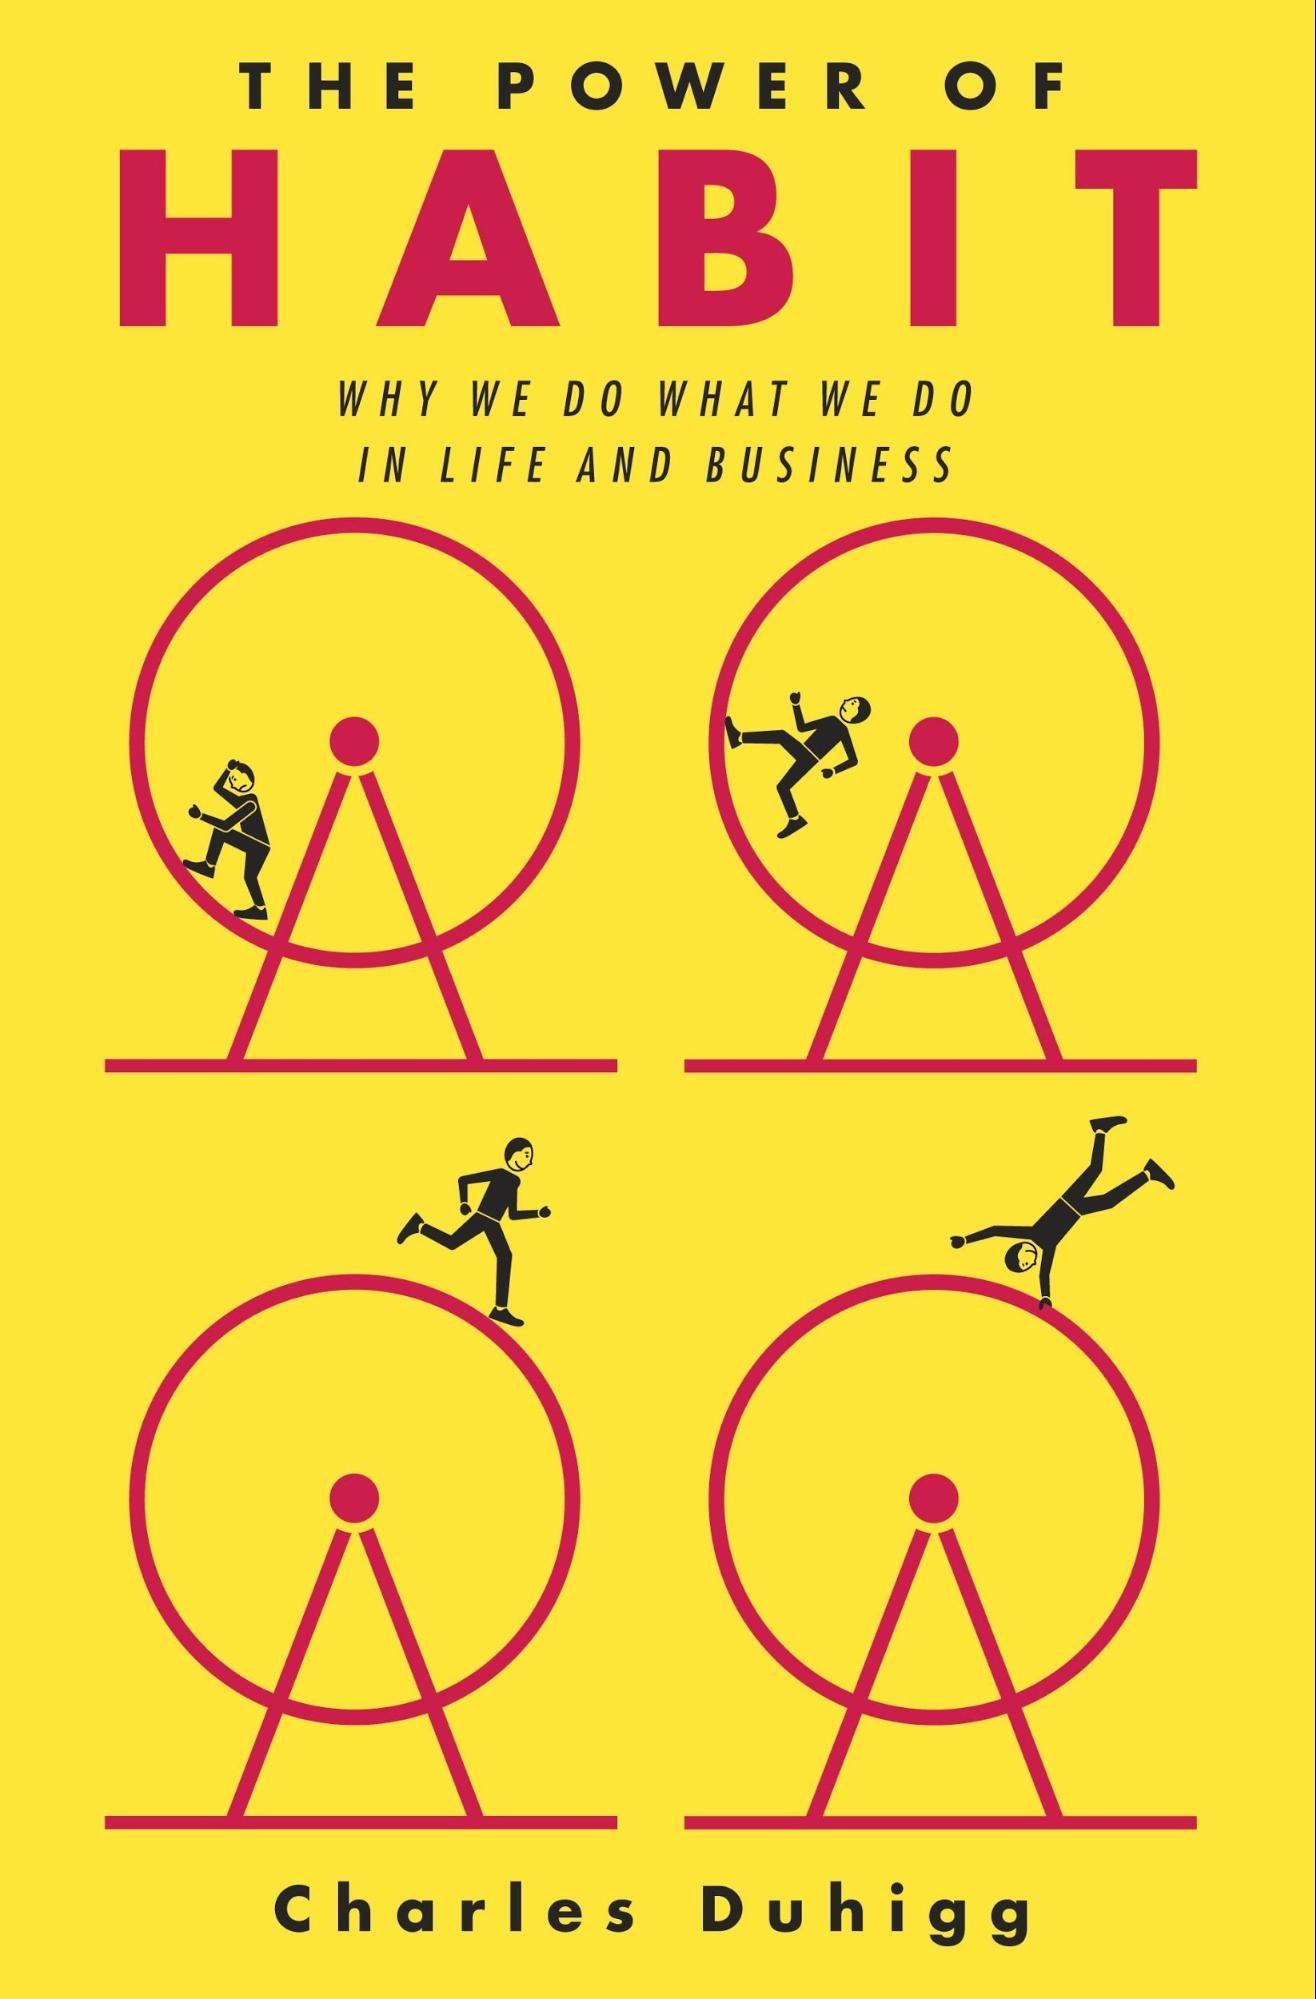 The Power of Habit – Charles Duhigg